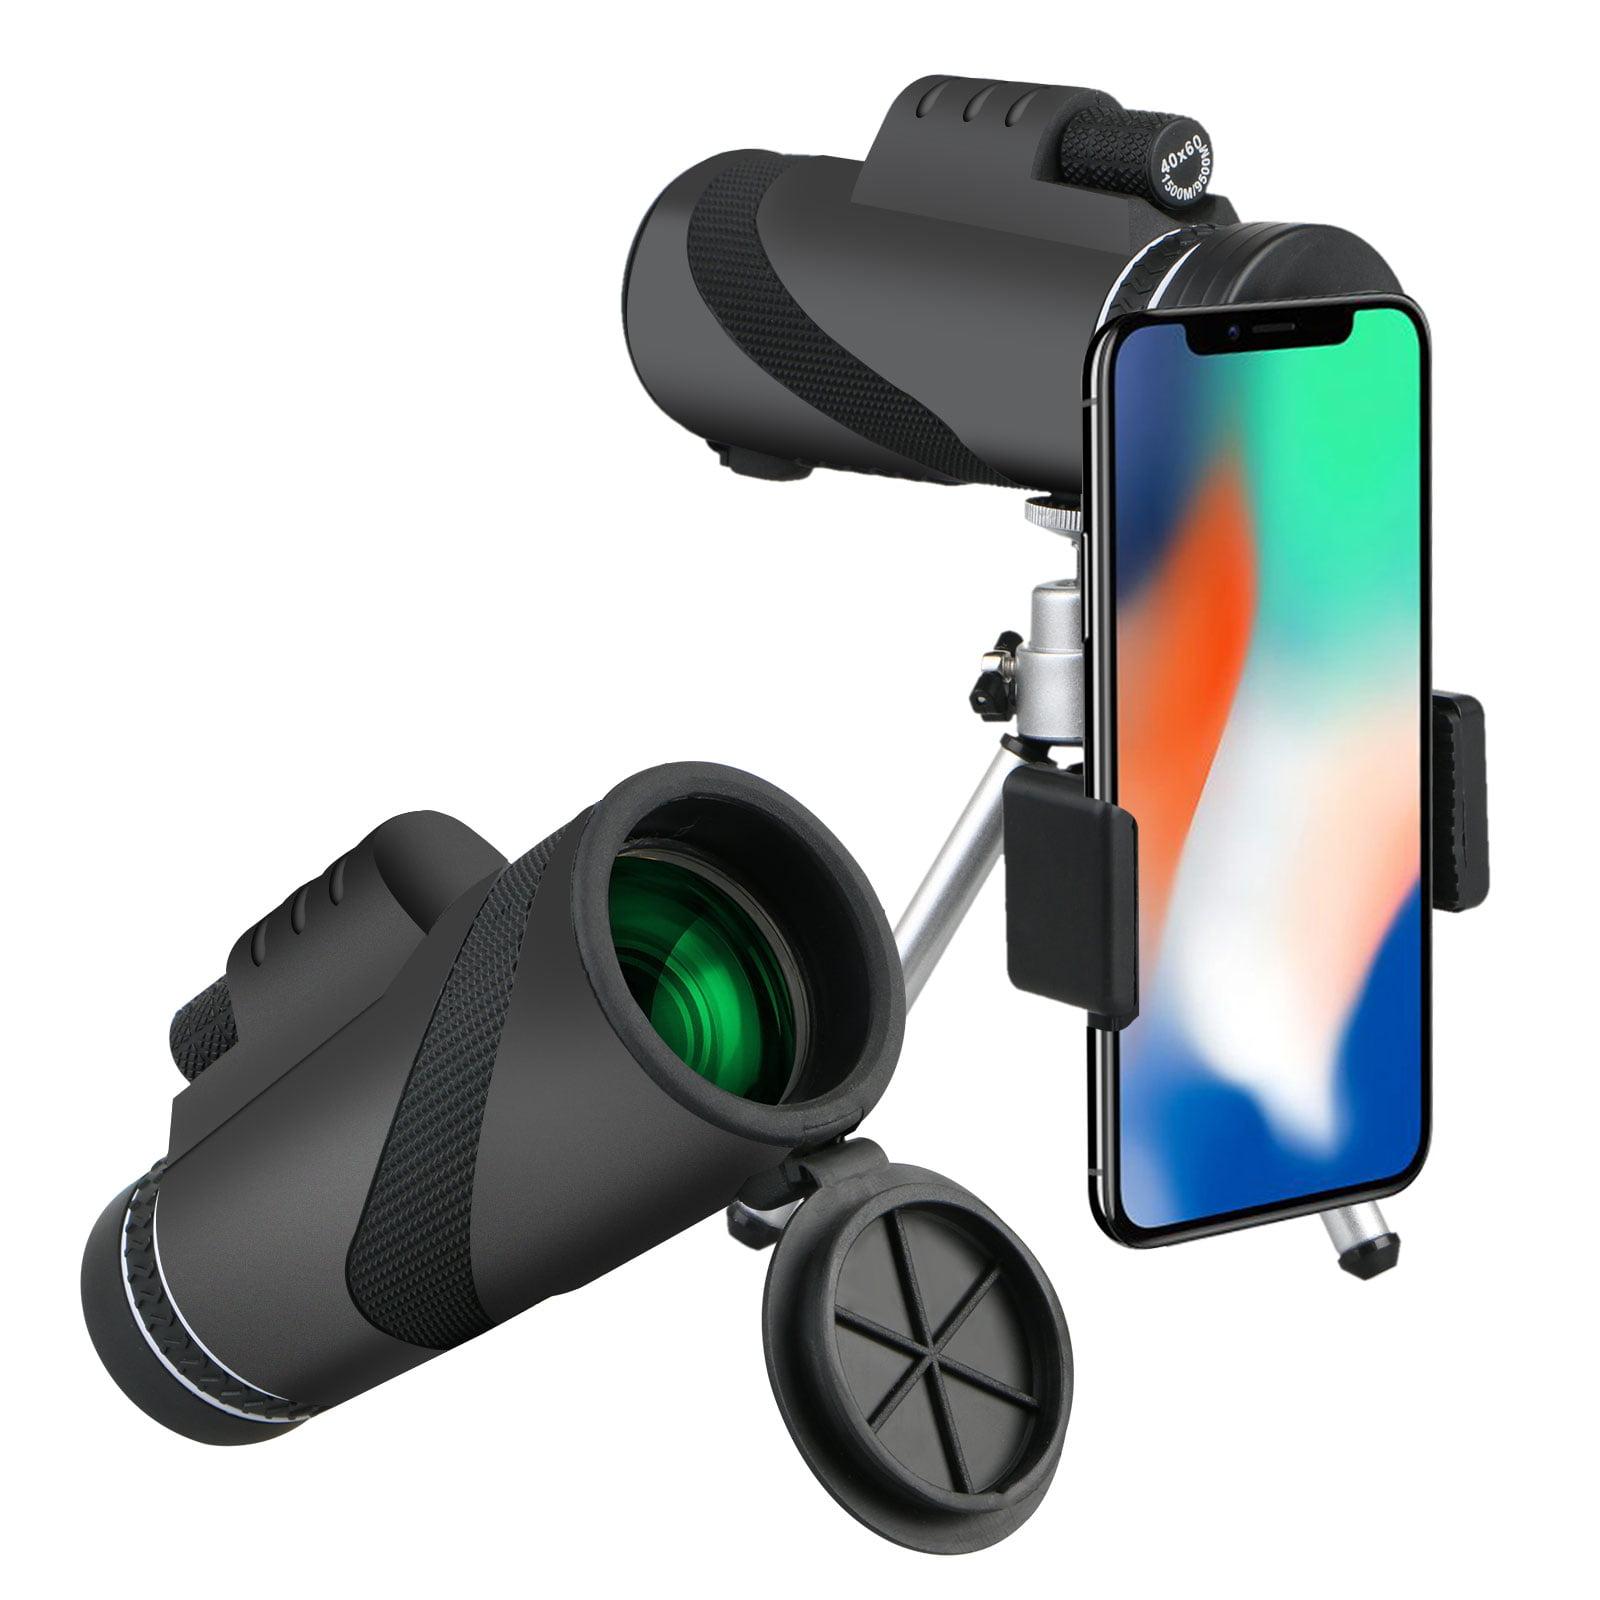 40x60 High Power Prism Monocular and Quick Smartphone Holder, Waterproof Fogproof Shockproof Scope, BAK4 Prism FMC for... by EEEKit